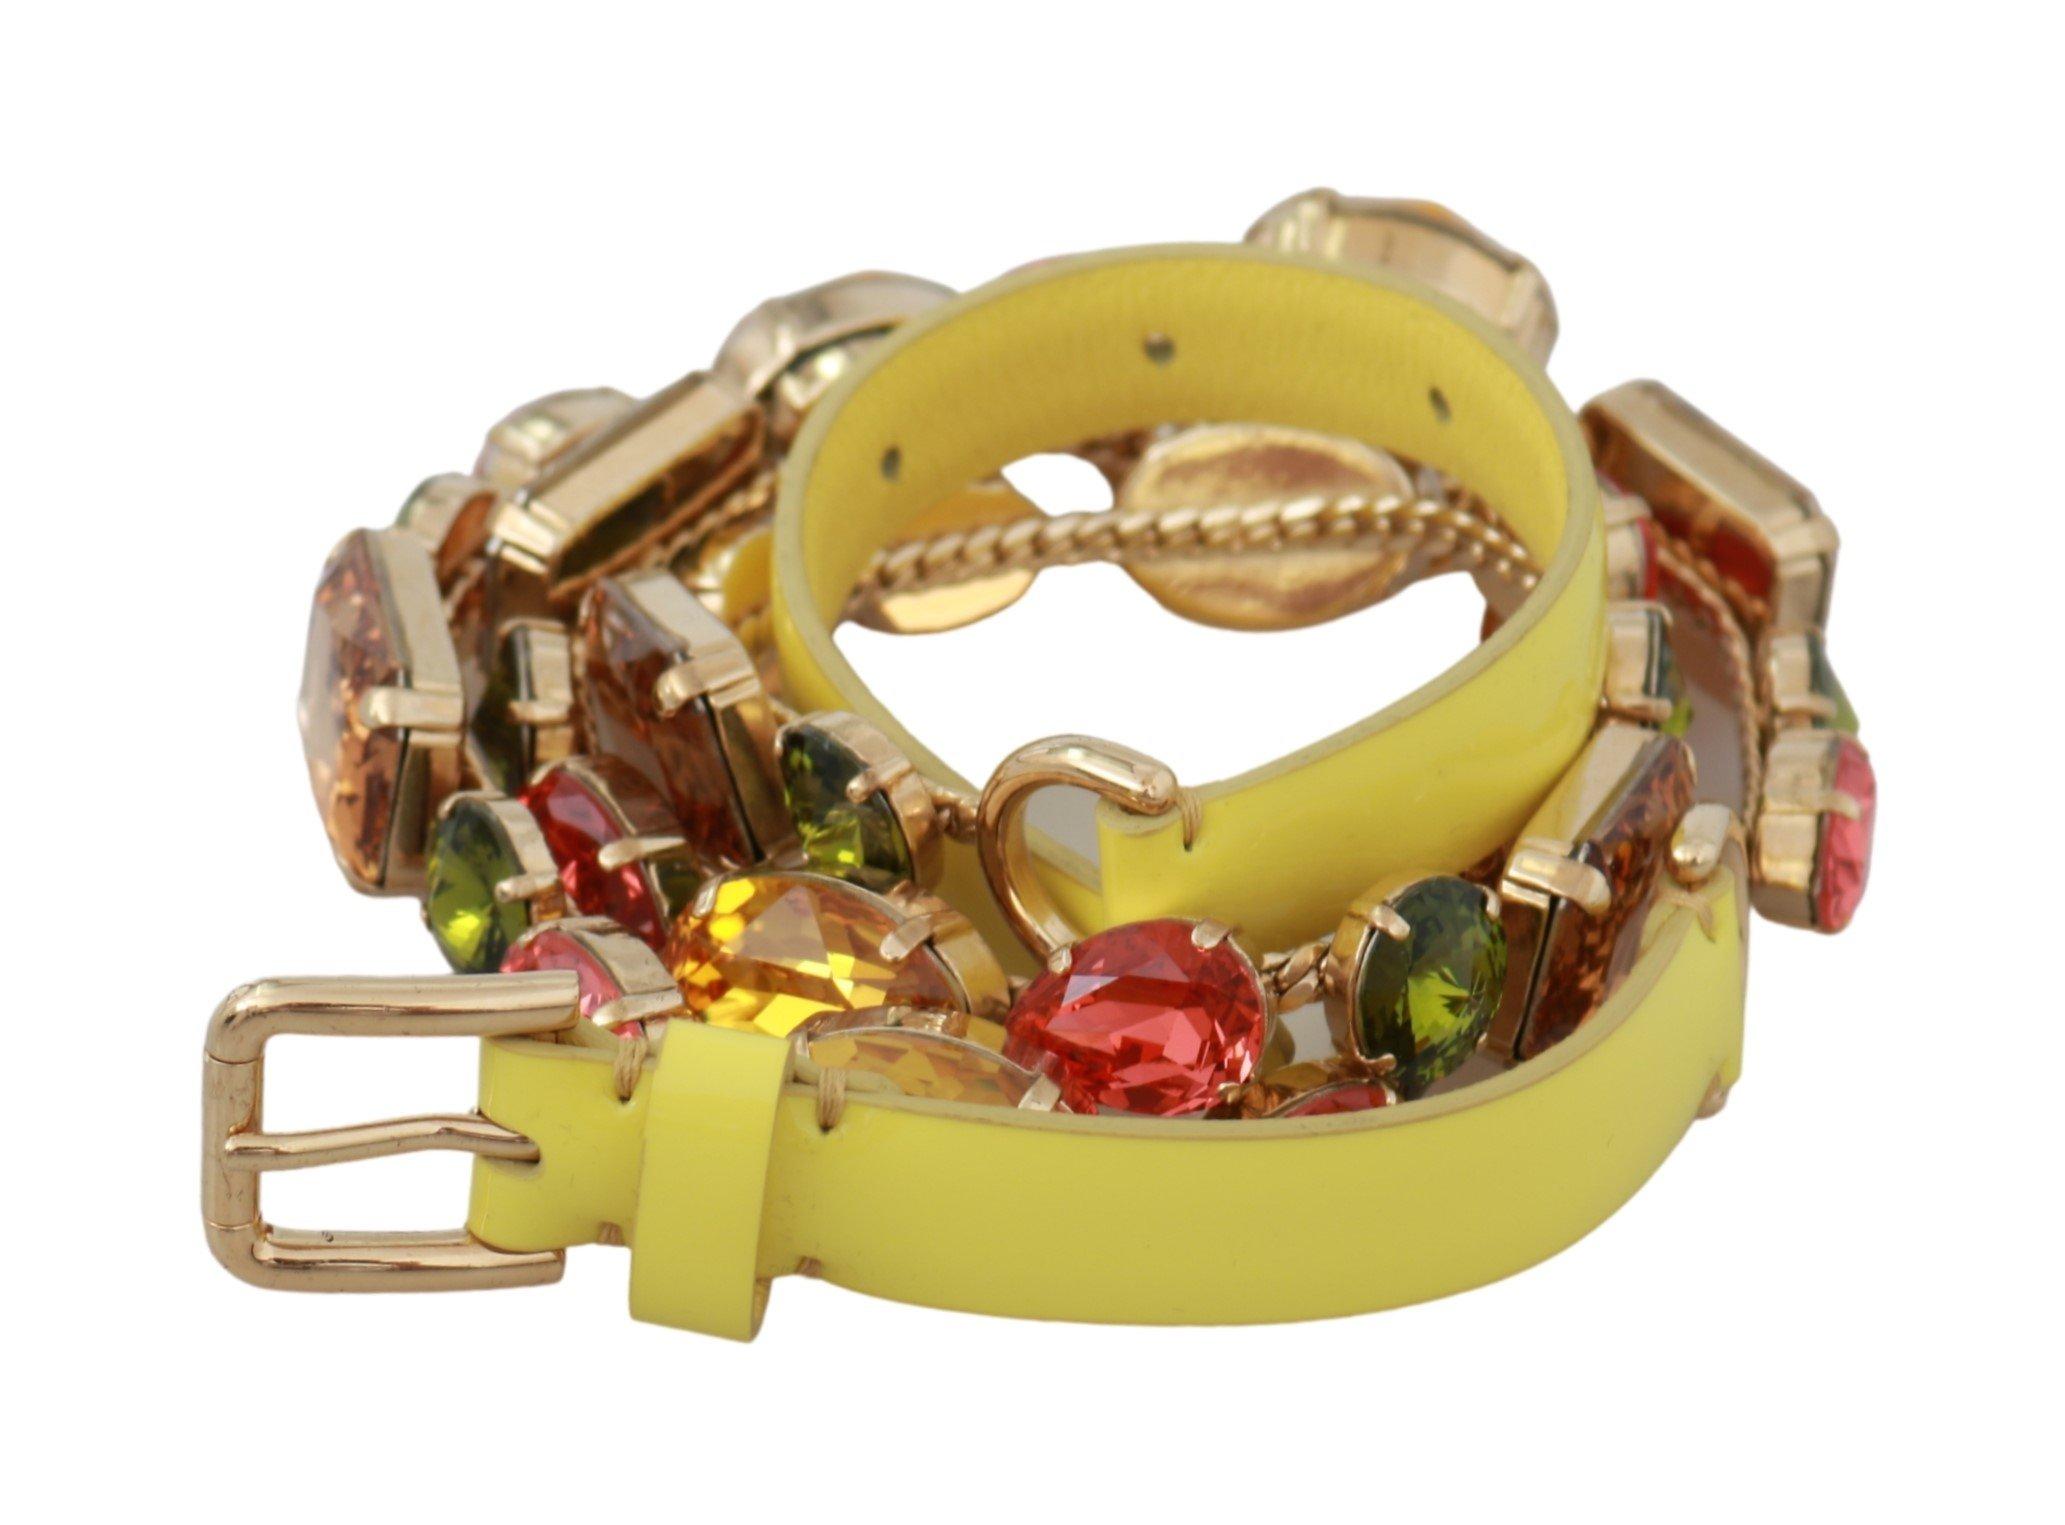 Dolce & Gabbana Women's Crystals Waist Belt Gold BEL60573 - 70 cm / 28 Inches